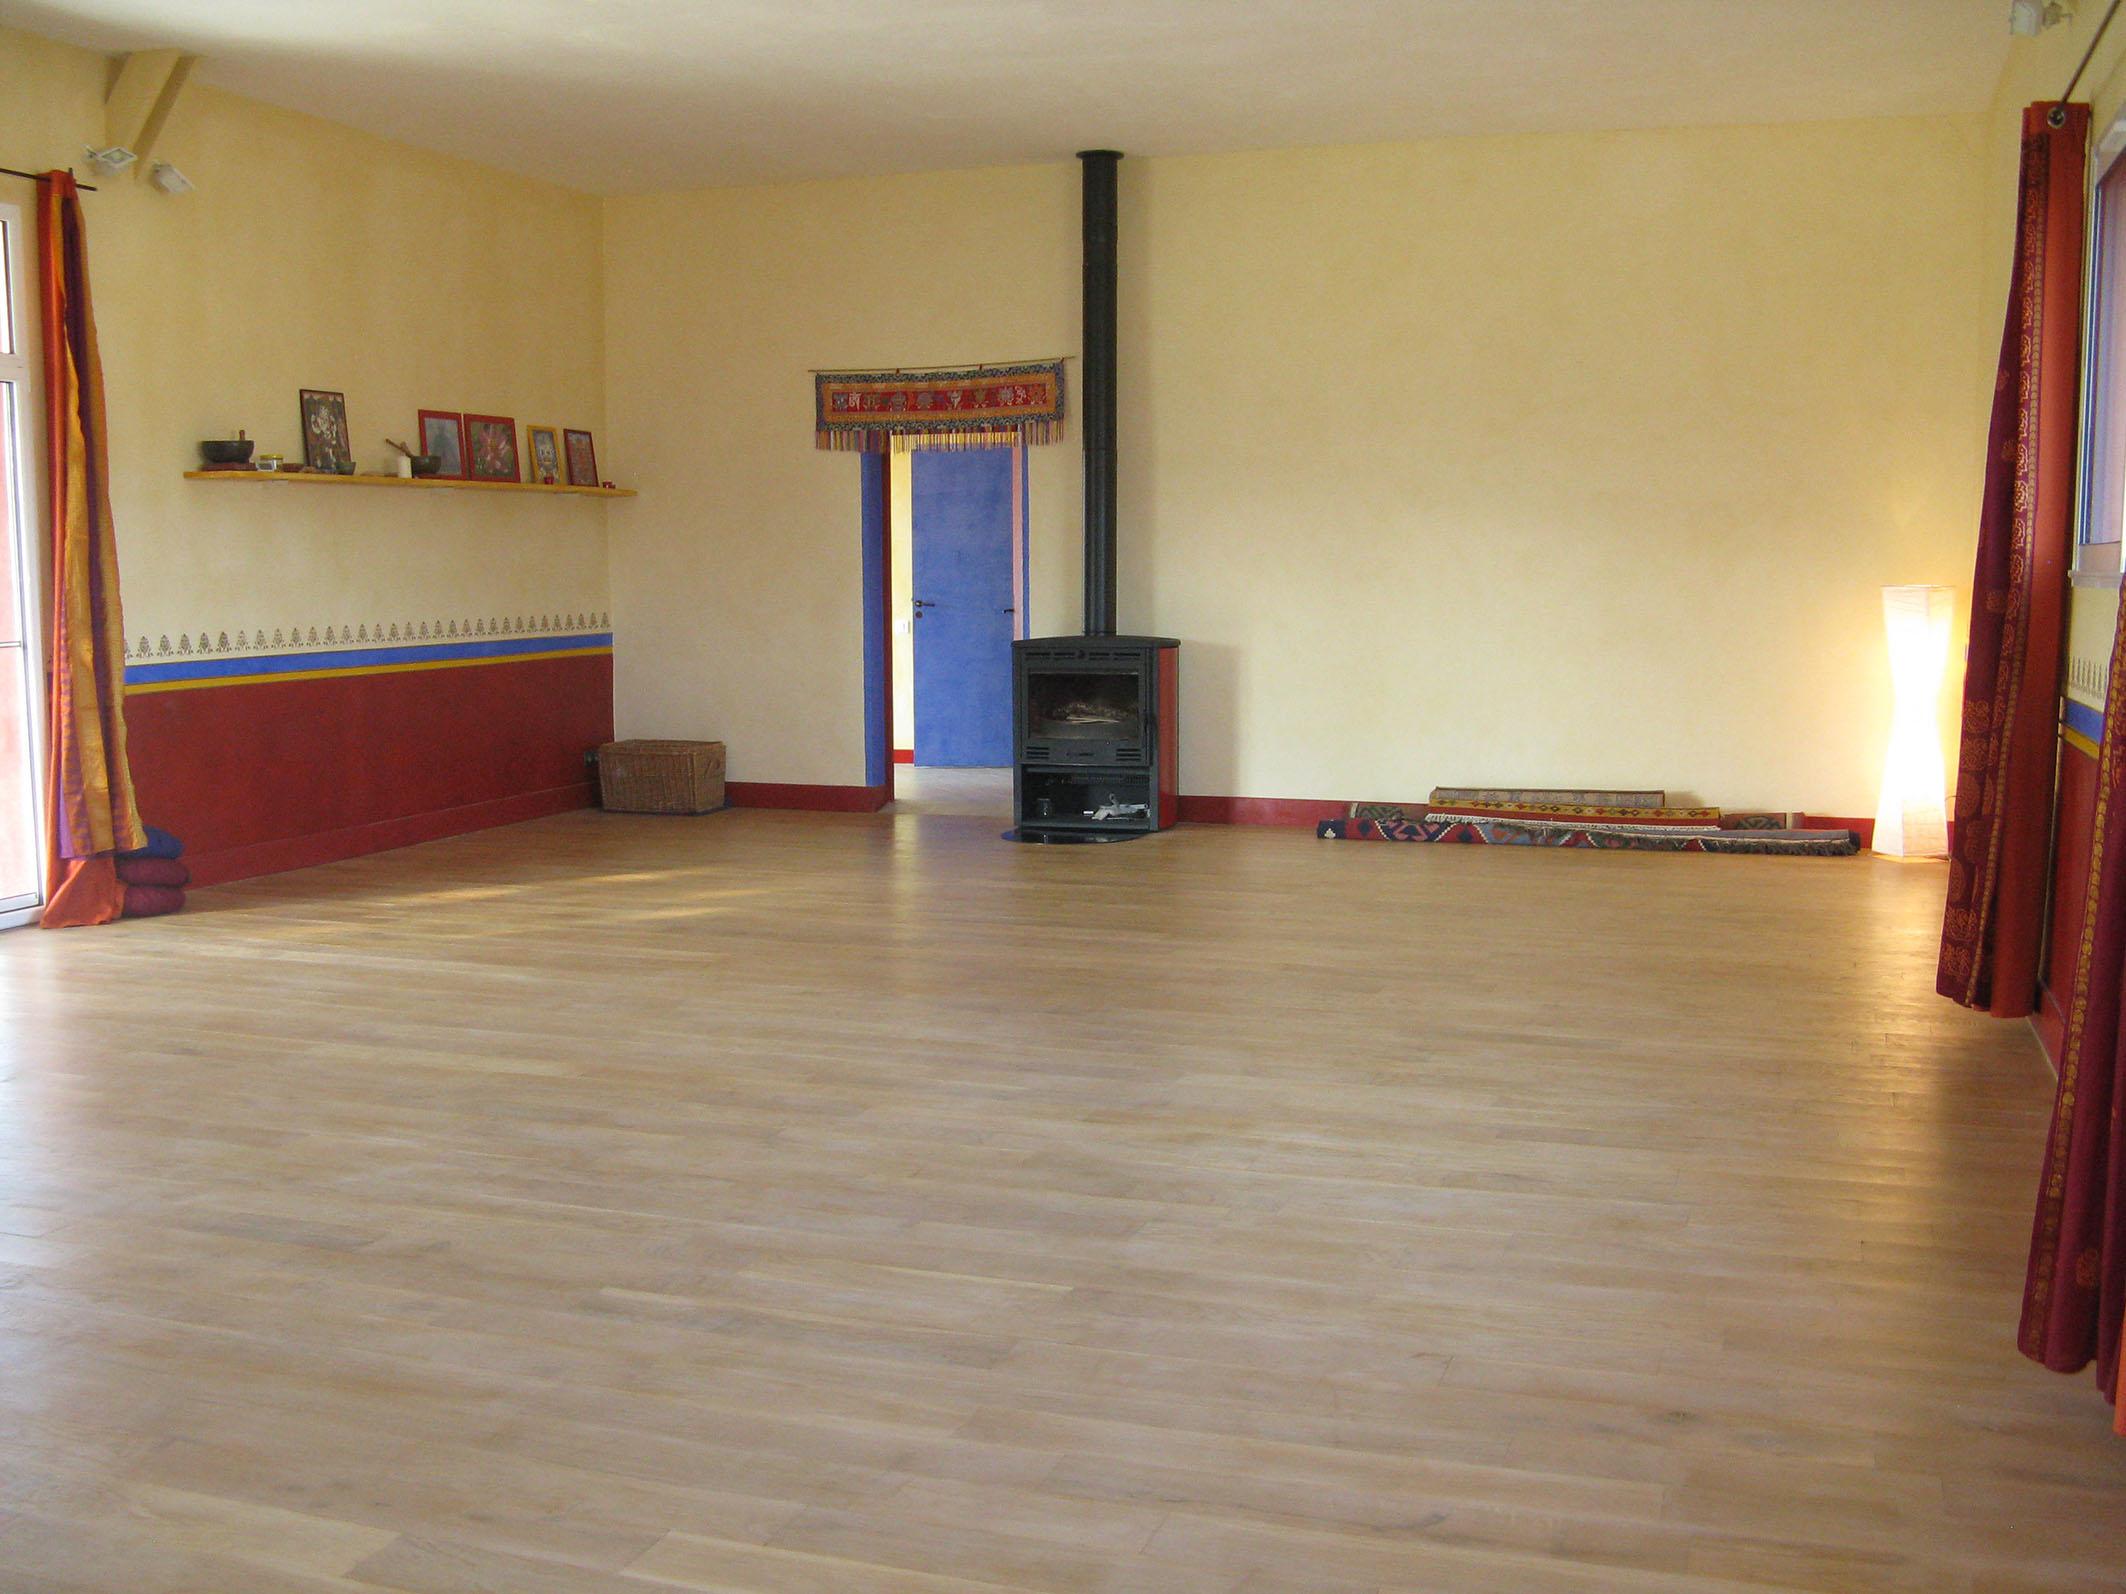 Salle avec poële, plancher en chêne